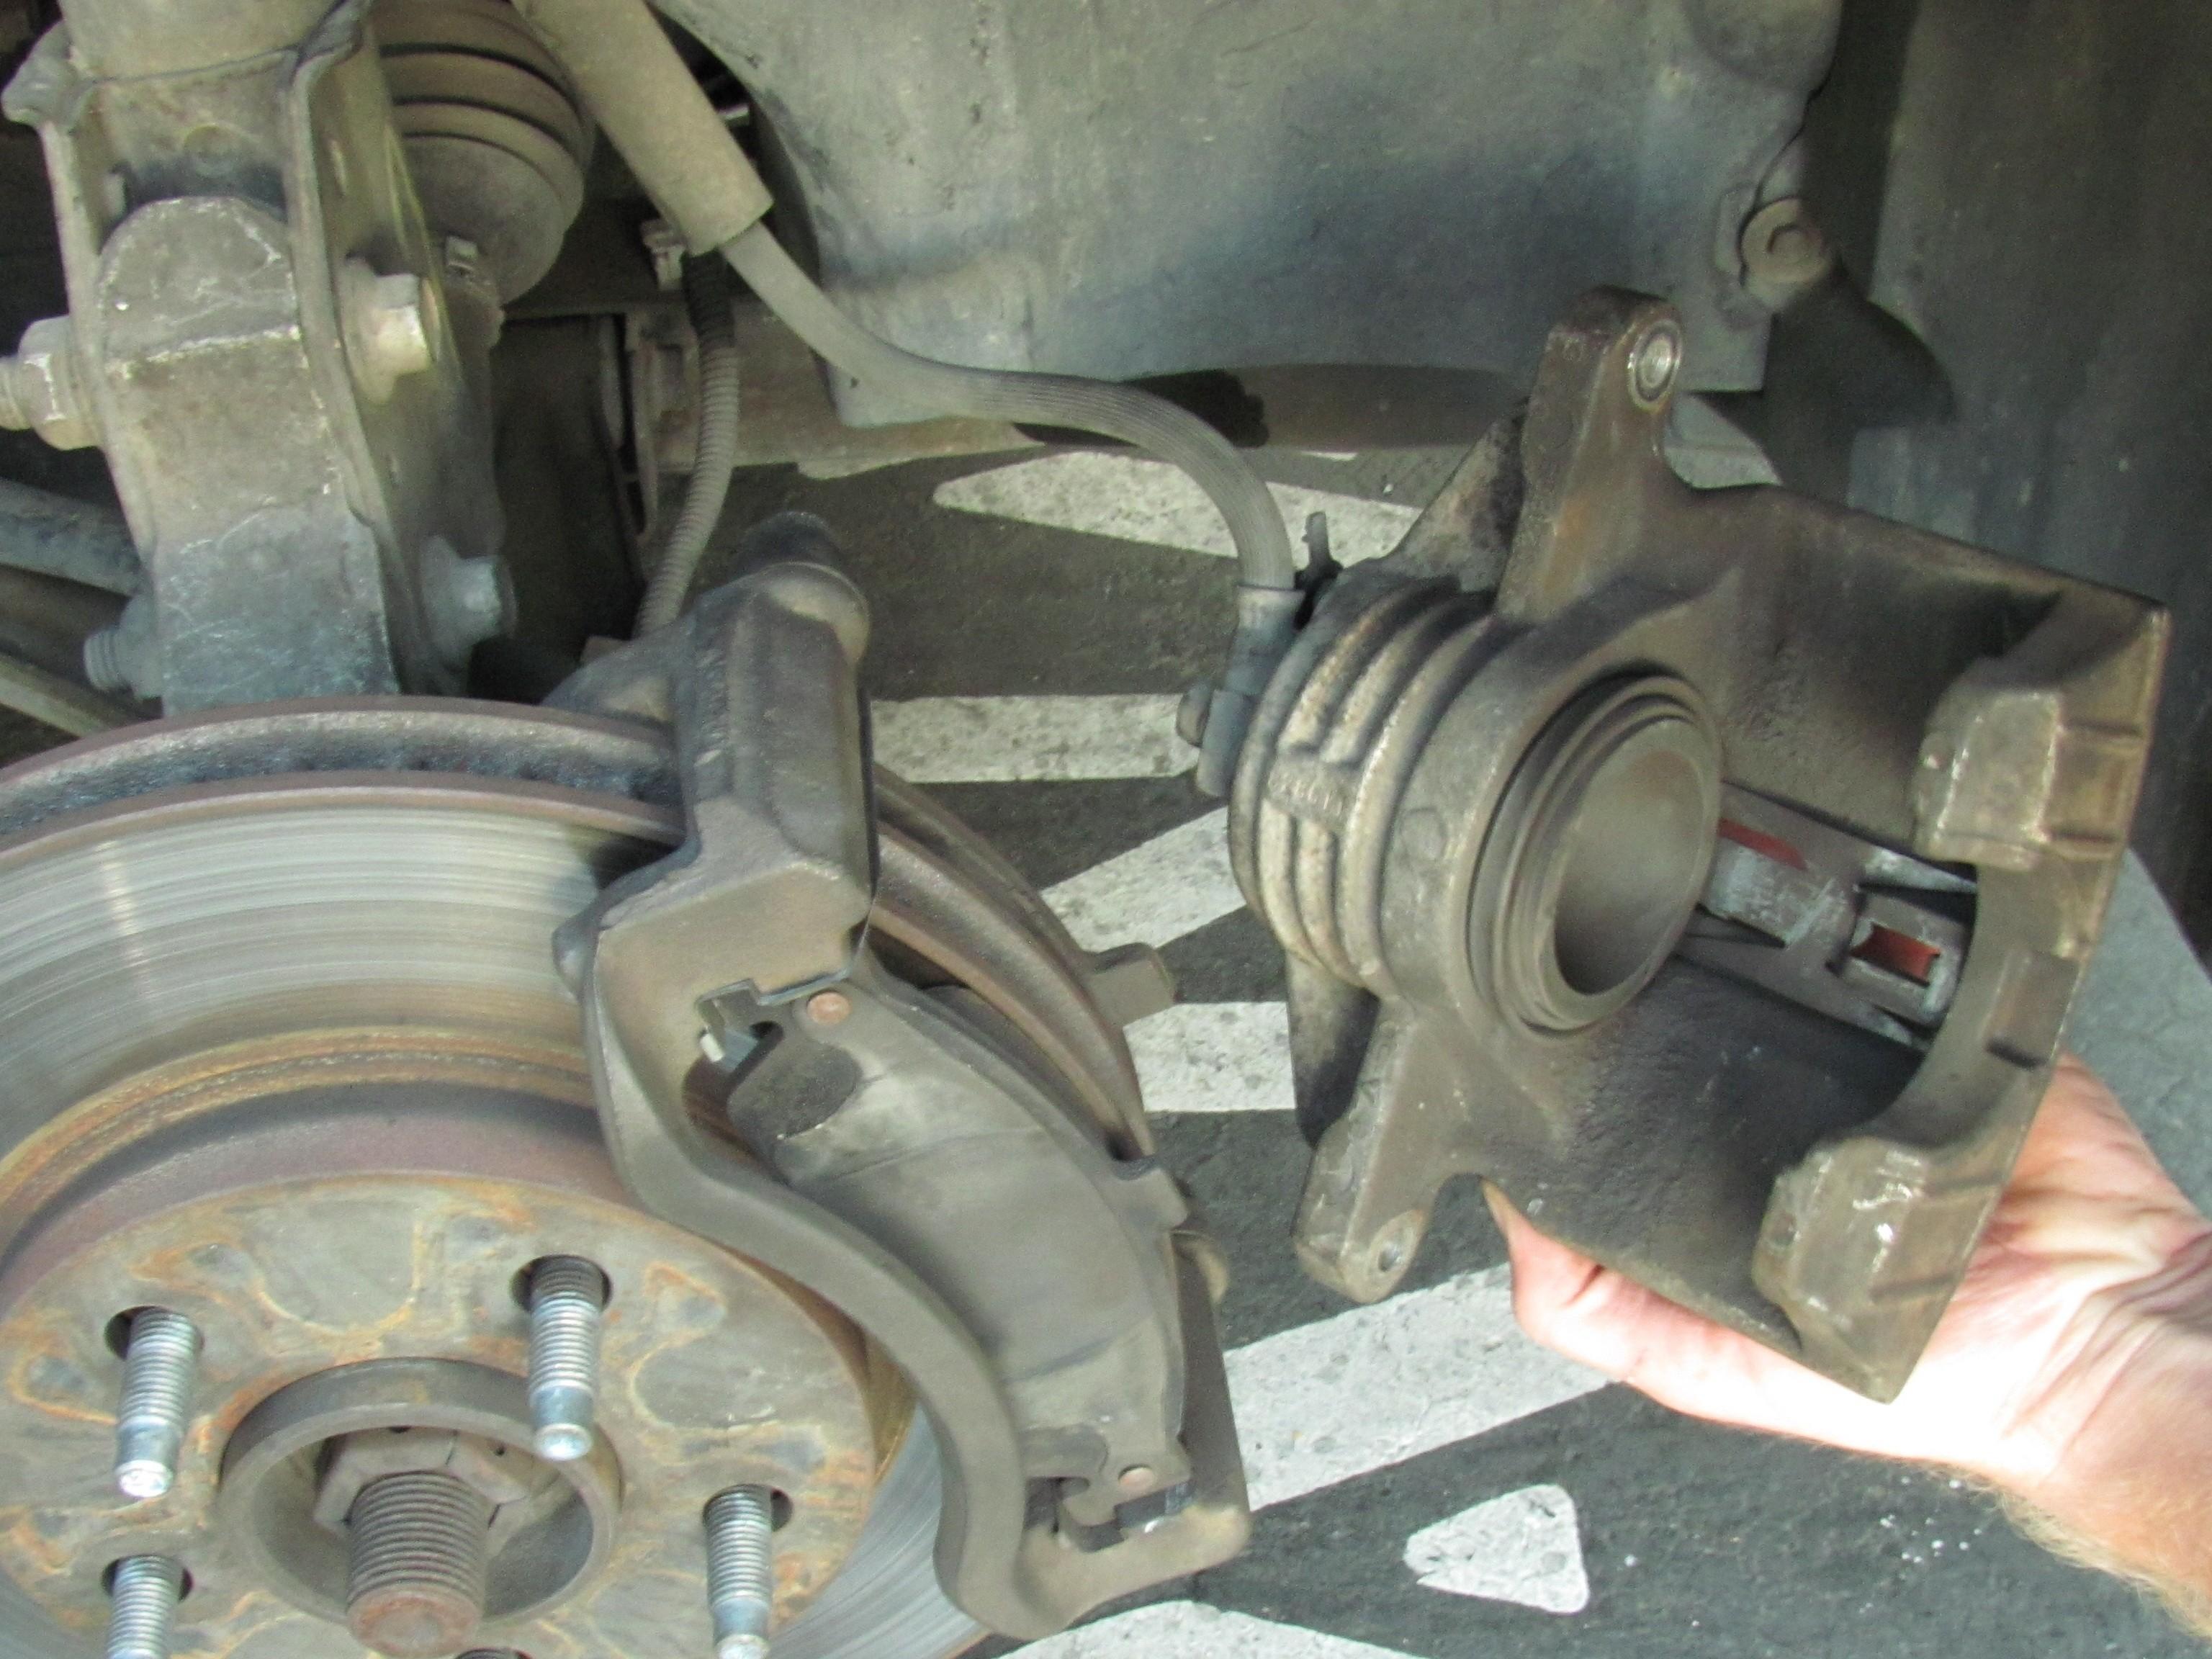 Rear Brake Shoes Diagram 1997 2003 Chevrolet Malibu Front Brake Pads Replacement 1997 1998 Of Rear Brake Shoes Diagram